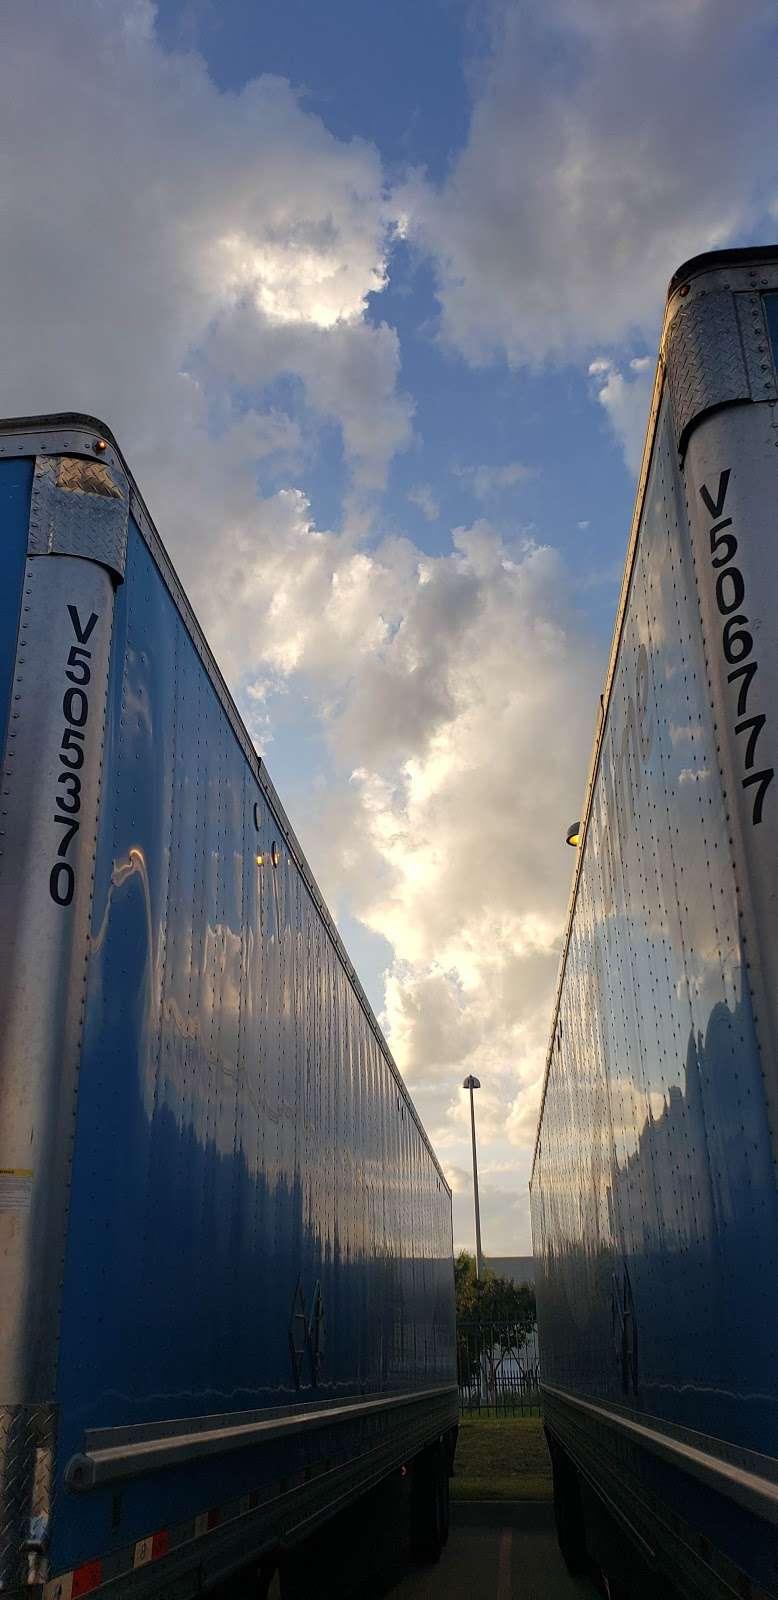 Amazon Fulfillment Center DFW8 - storage    Photo 9 of 10   Address: 2700 Regent Blvd, Irving, TX 75063, USA